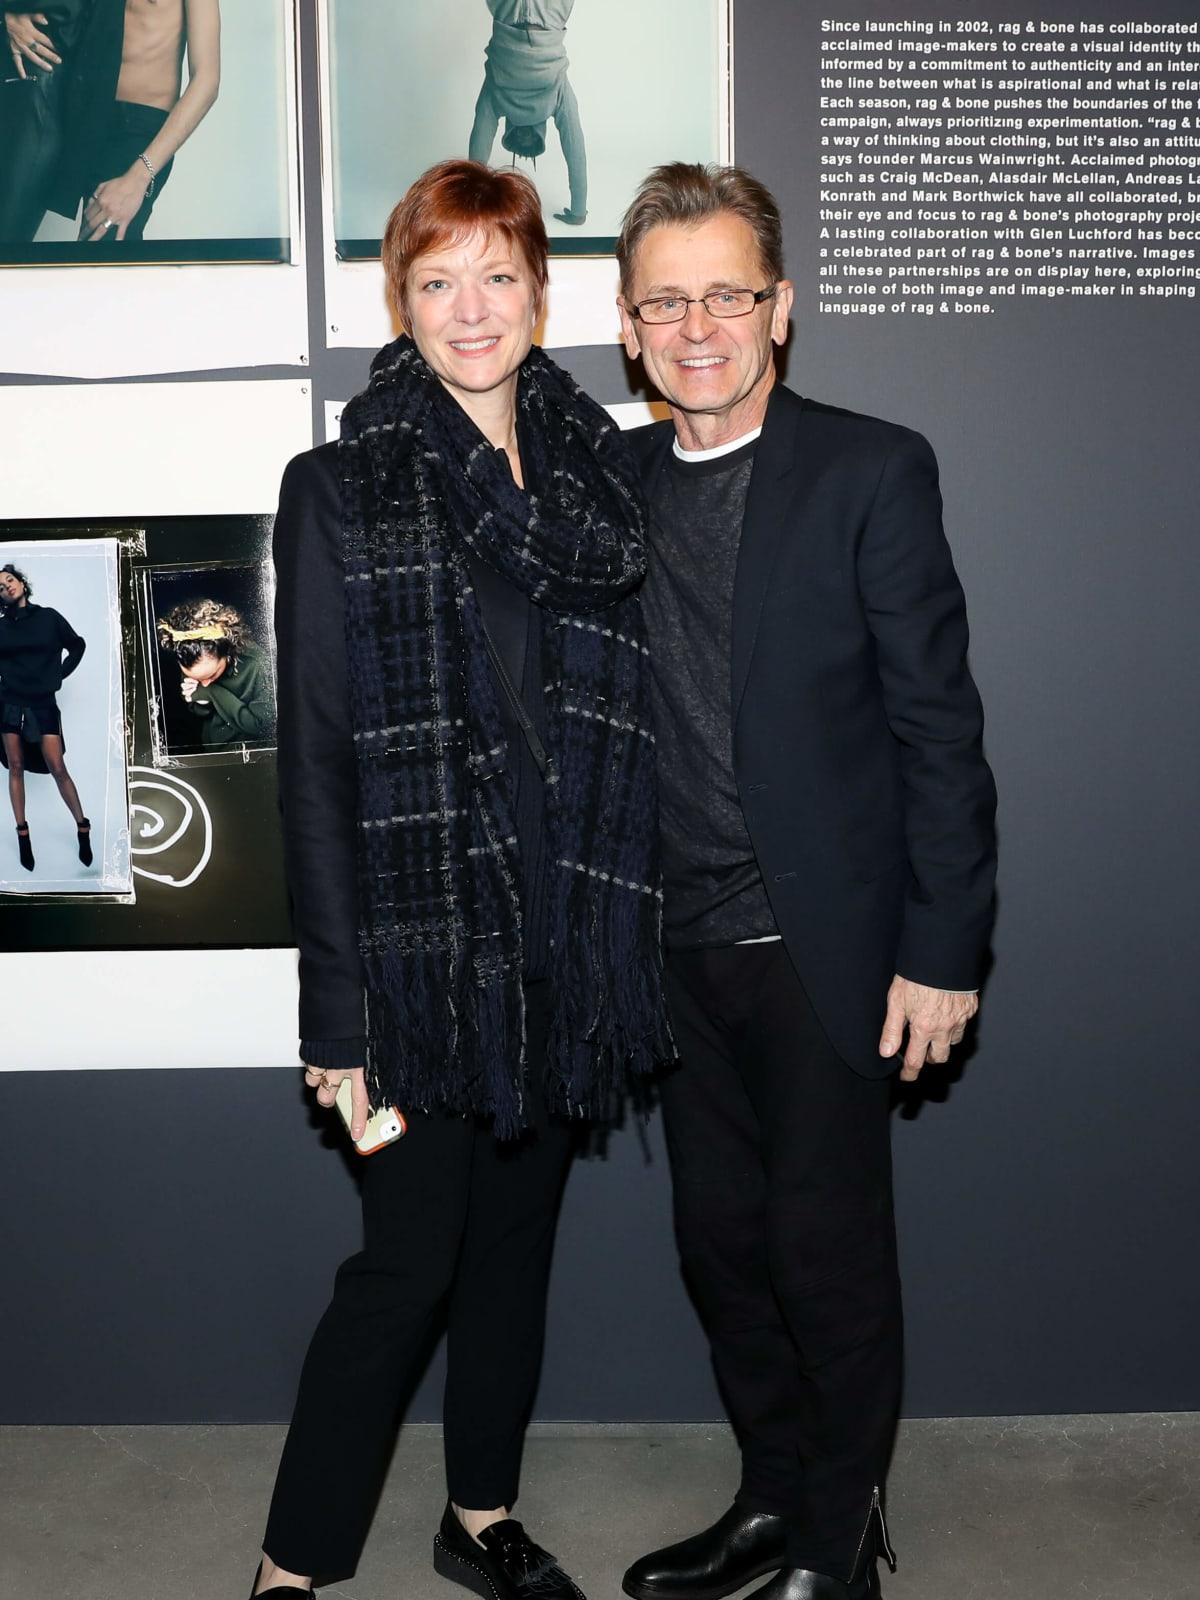 Lisa Rinehart, Mikhail Baryshnikov at Rag & Bone exhibition, party